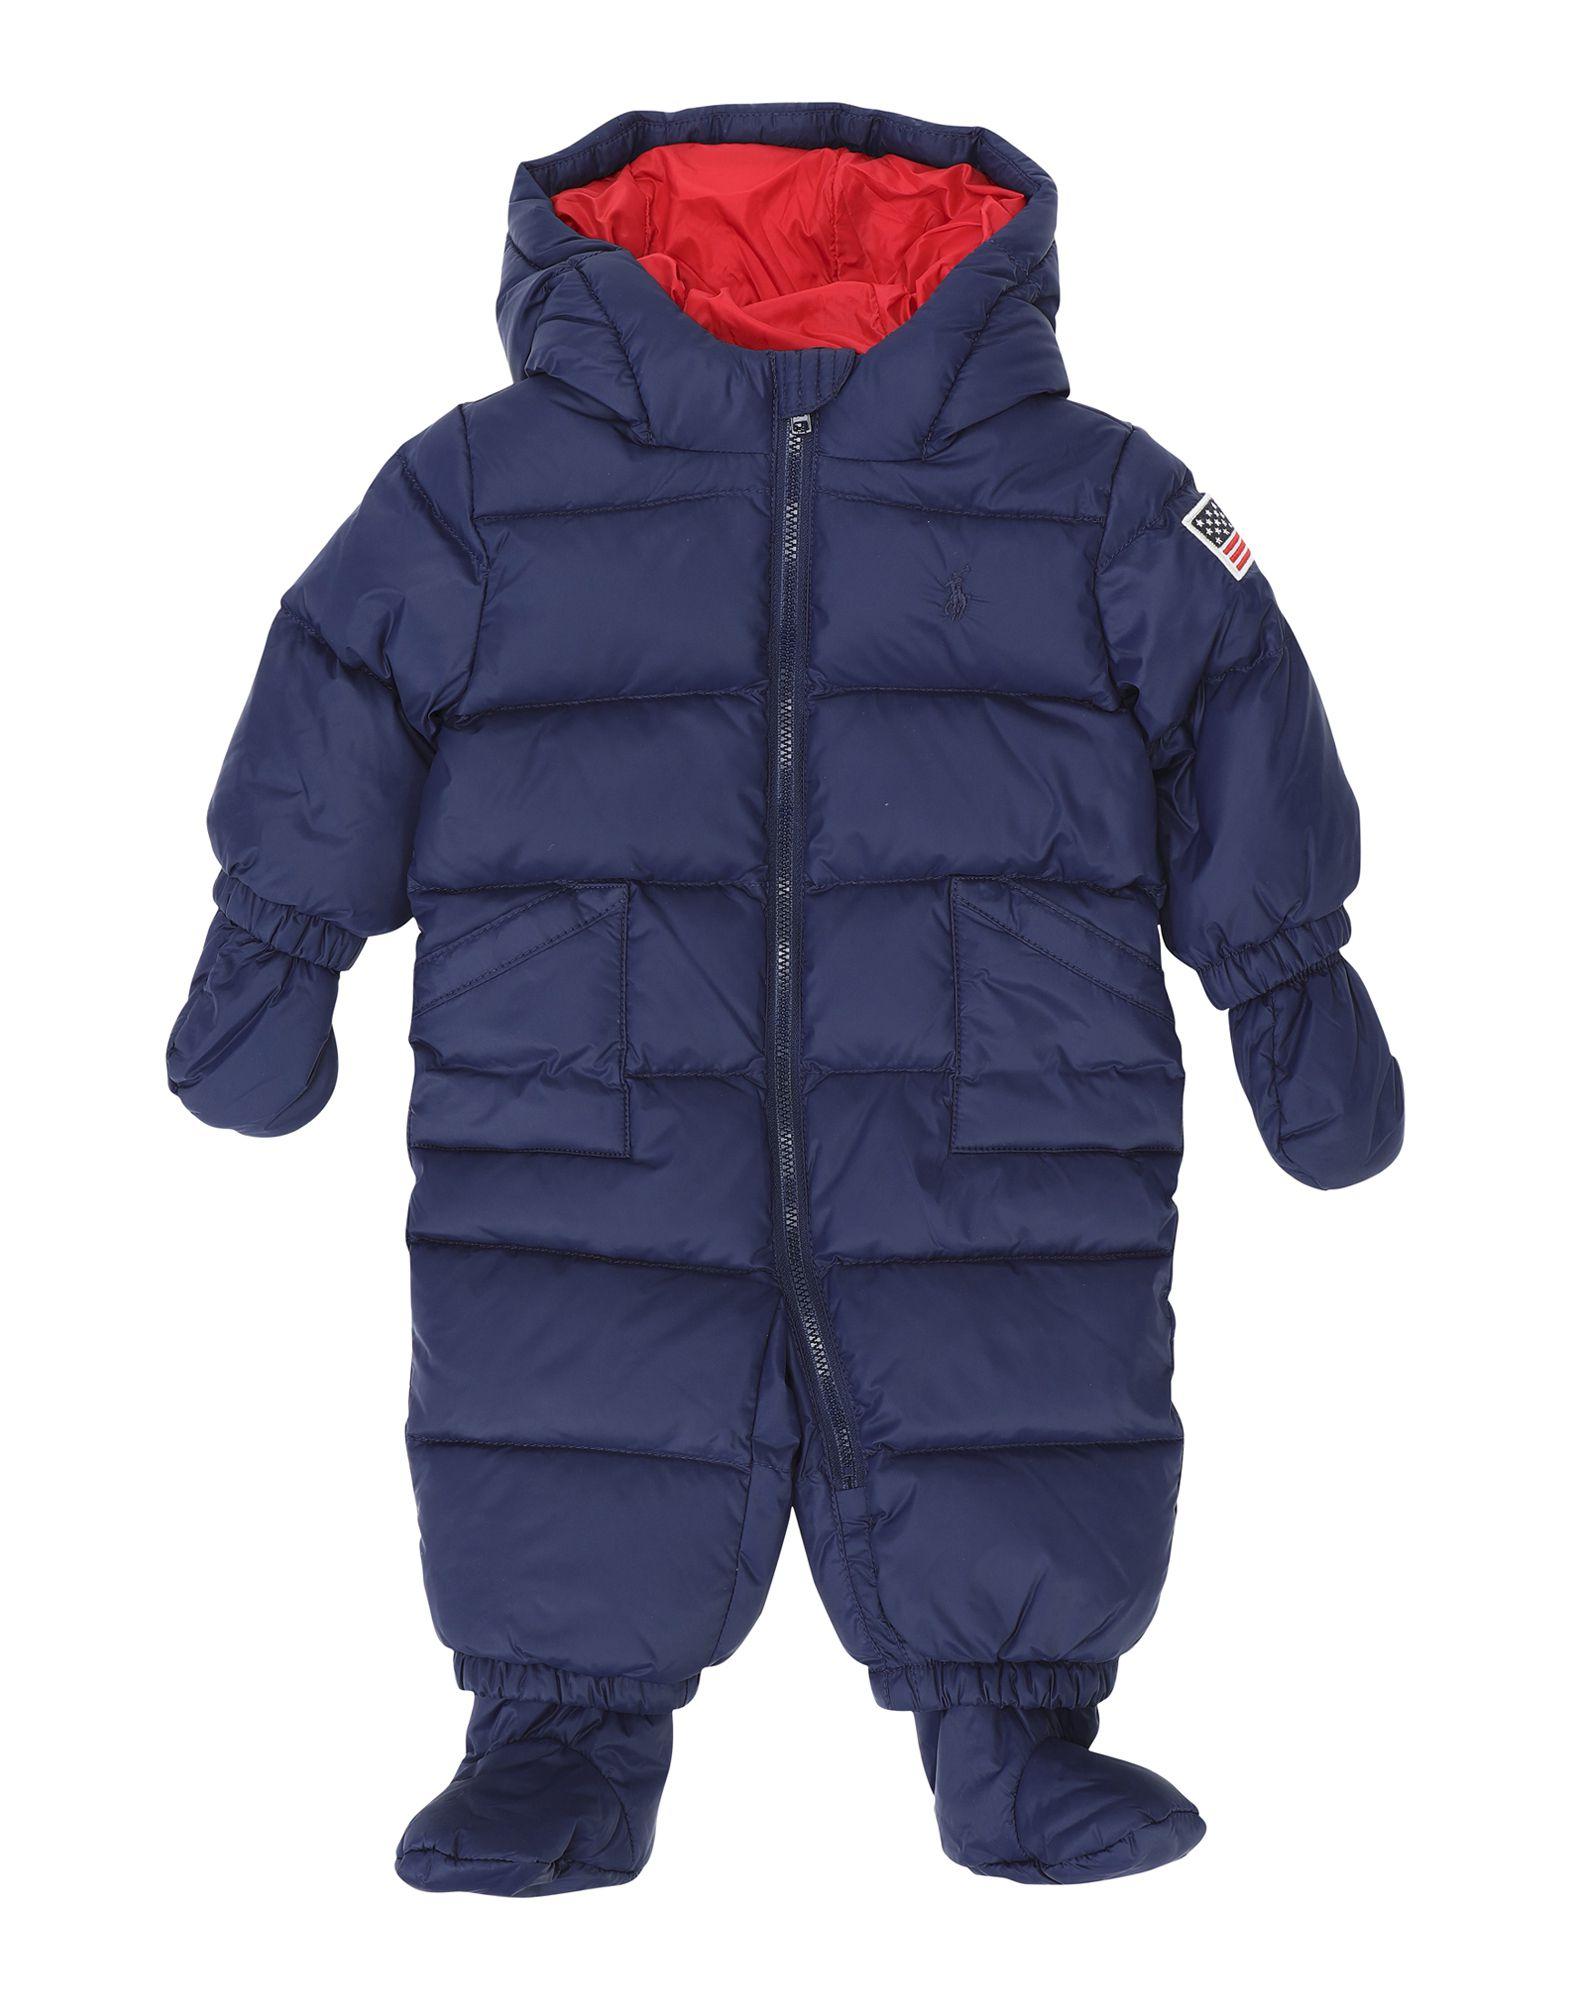 766c35c7d1d3 Φόρμες Και Ρούχα Για Το Χιόνι Ralph Lauren Αγόρι 0-24 μηνών στο YOOX